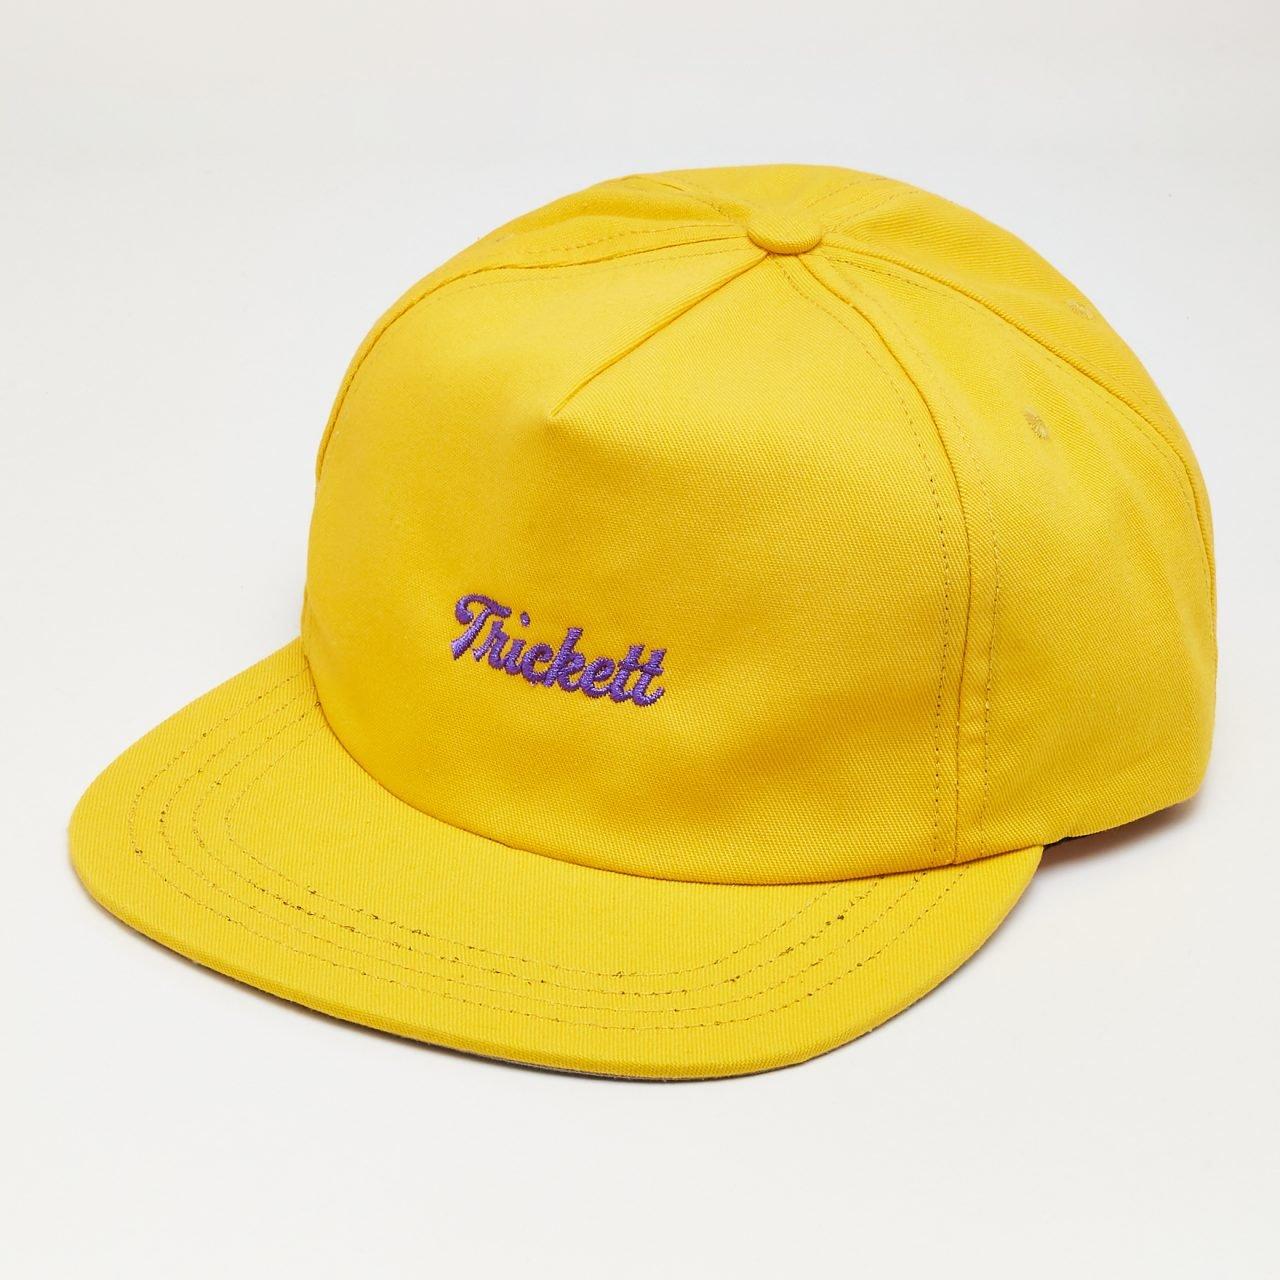 Smith Cap – LA Gold